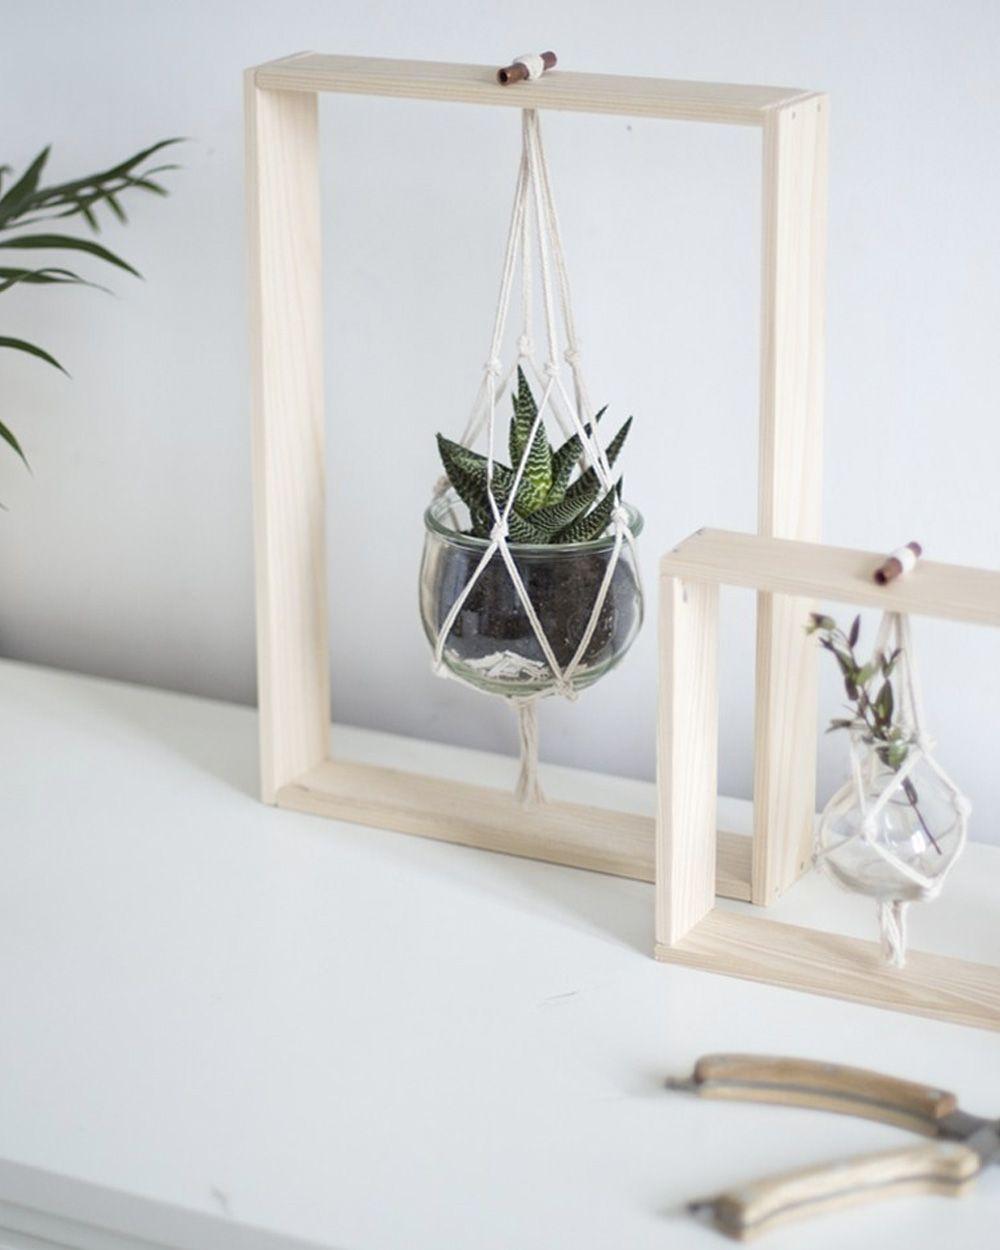 10 astuces diy pour suspendre vos plantes dekoracje. Black Bedroom Furniture Sets. Home Design Ideas